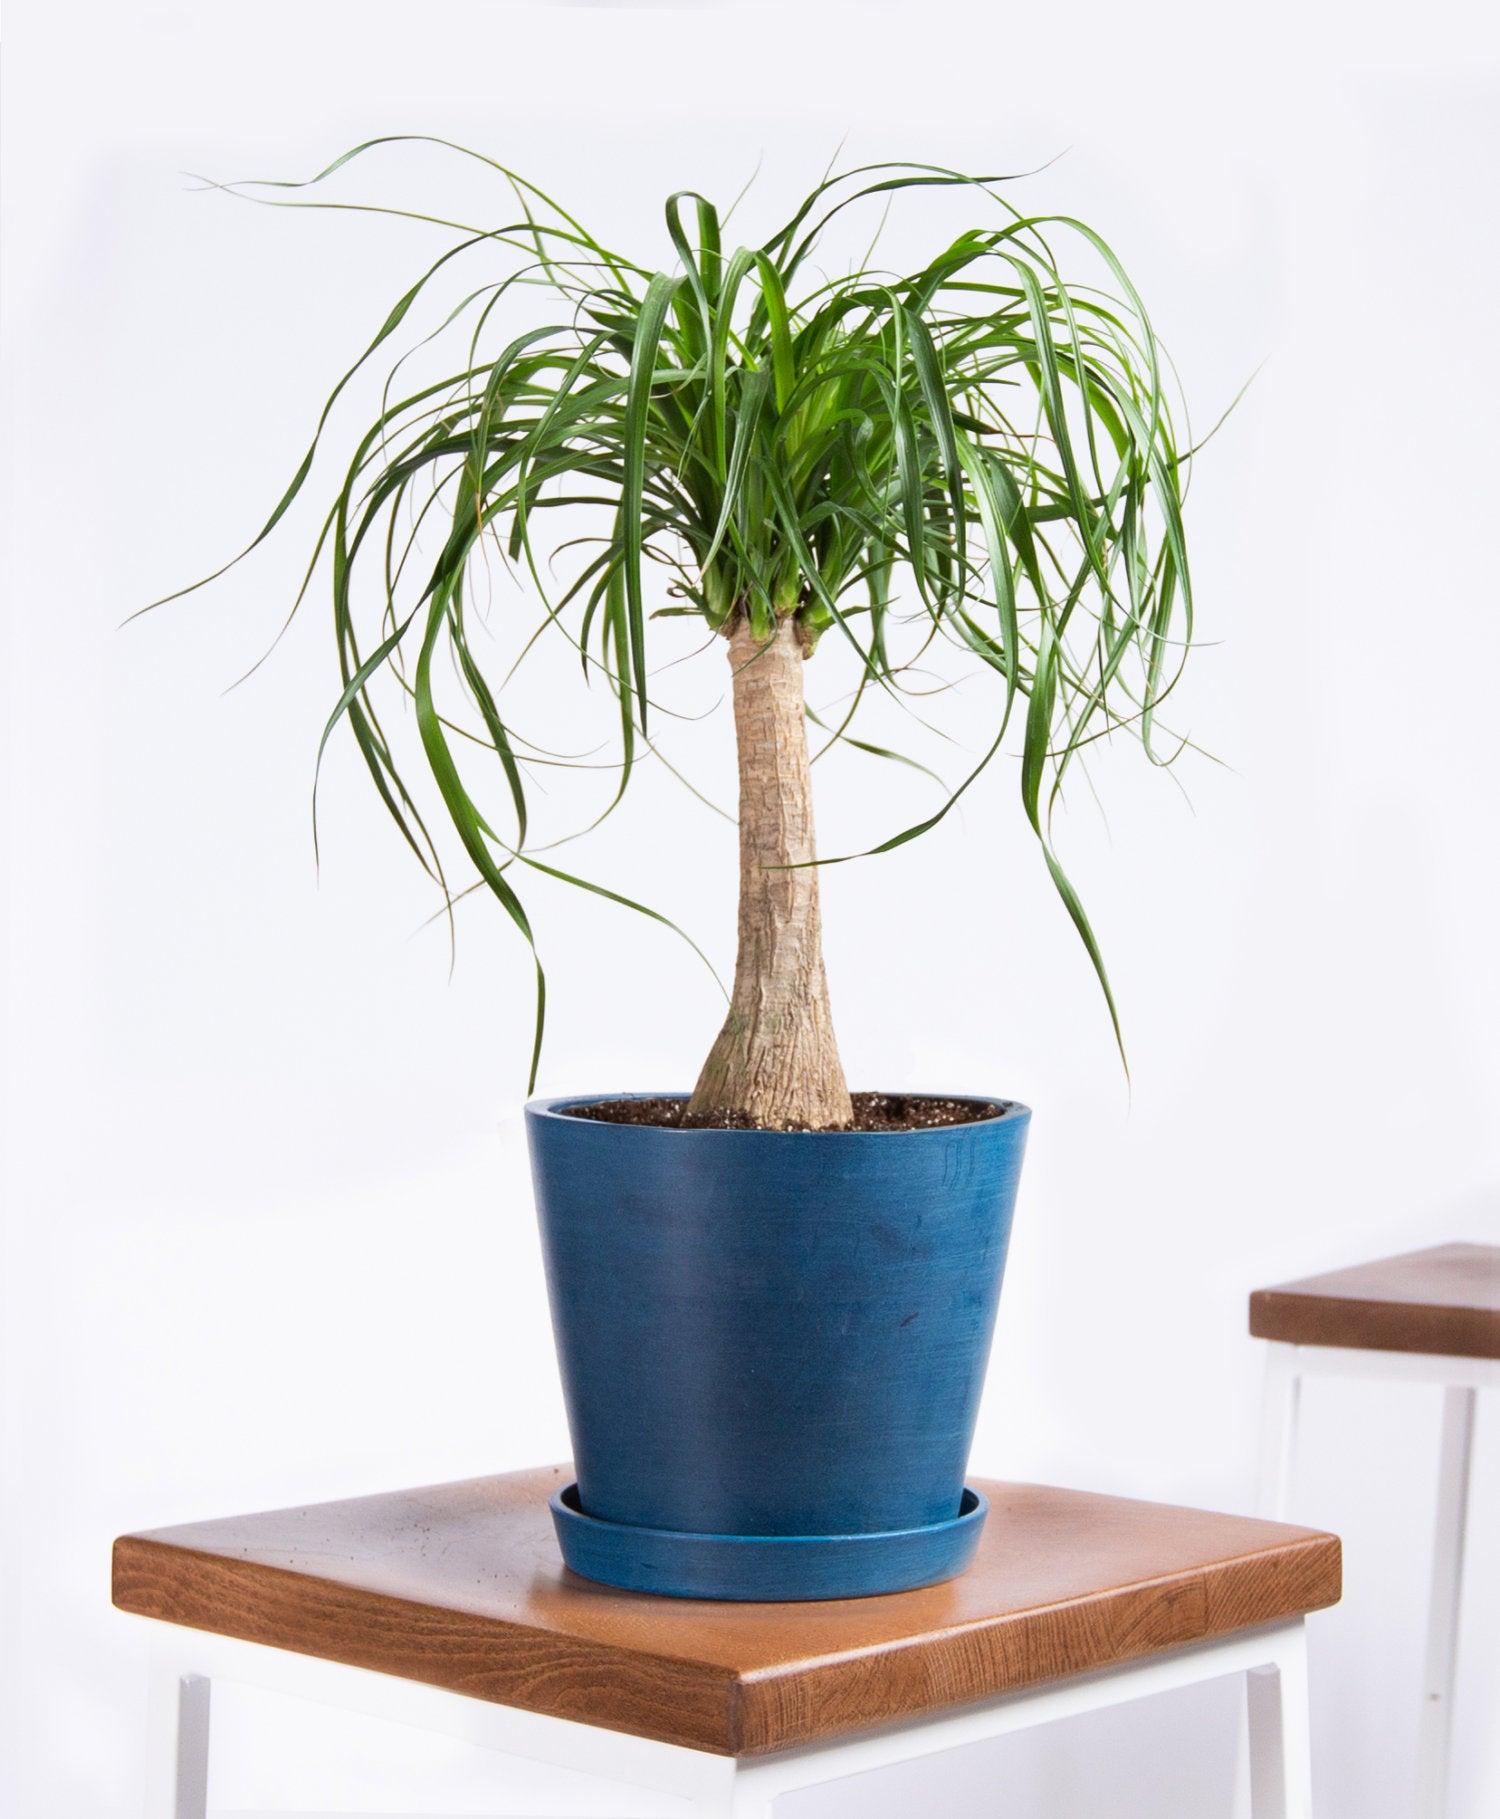 bloomscape_product-ponytail-palm-indigo-1500×1819